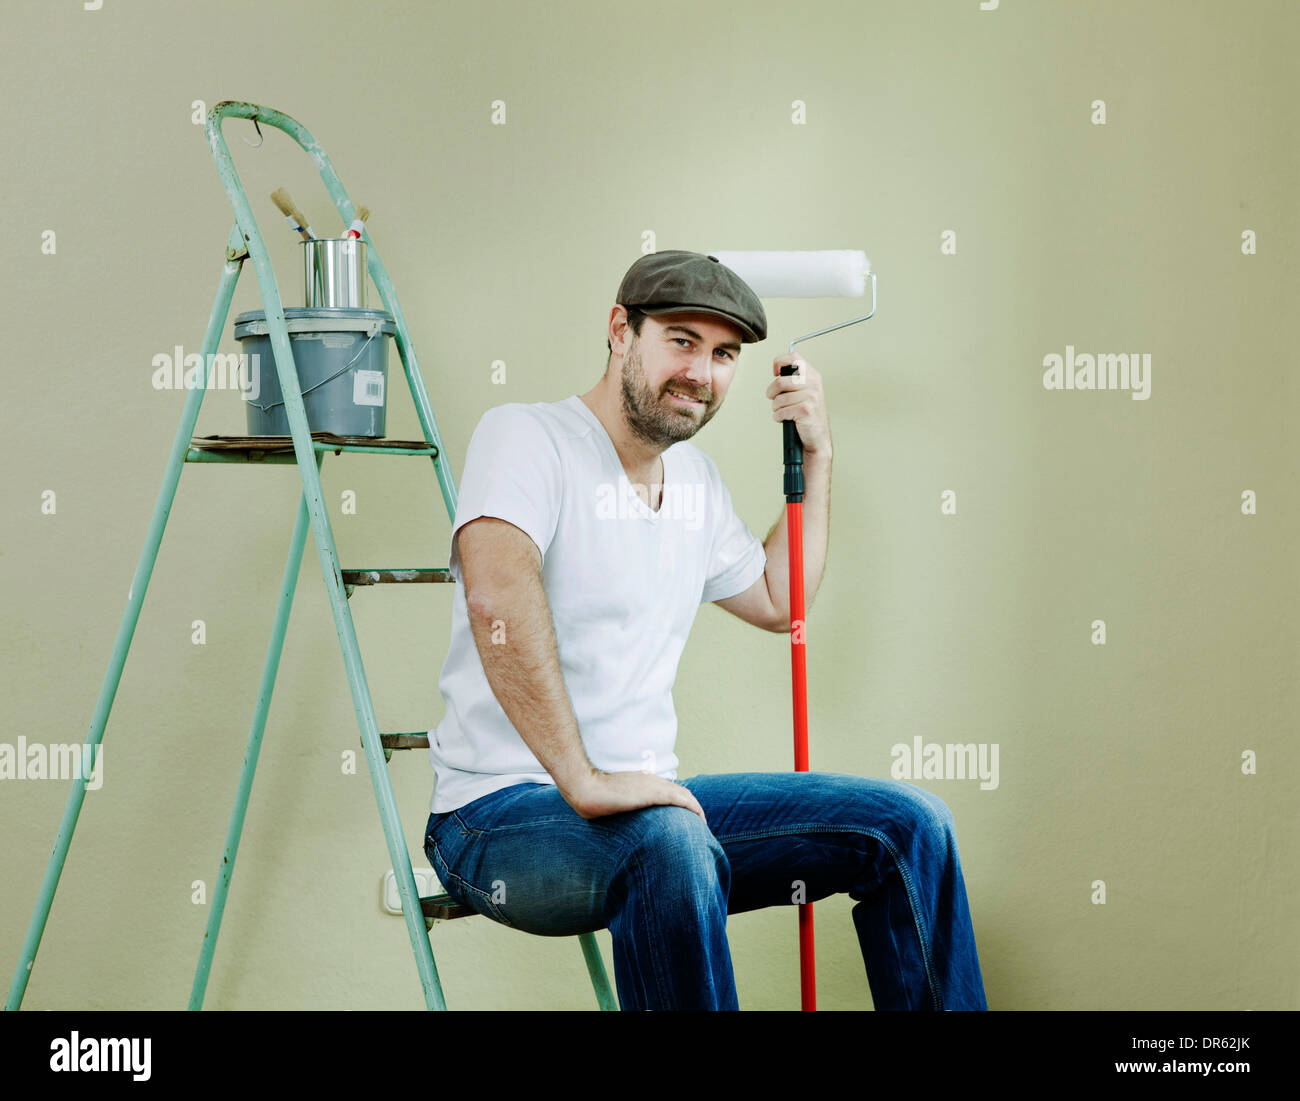 Man decorating, taking a break, Munich, Bavaria, Germany Stock Photo